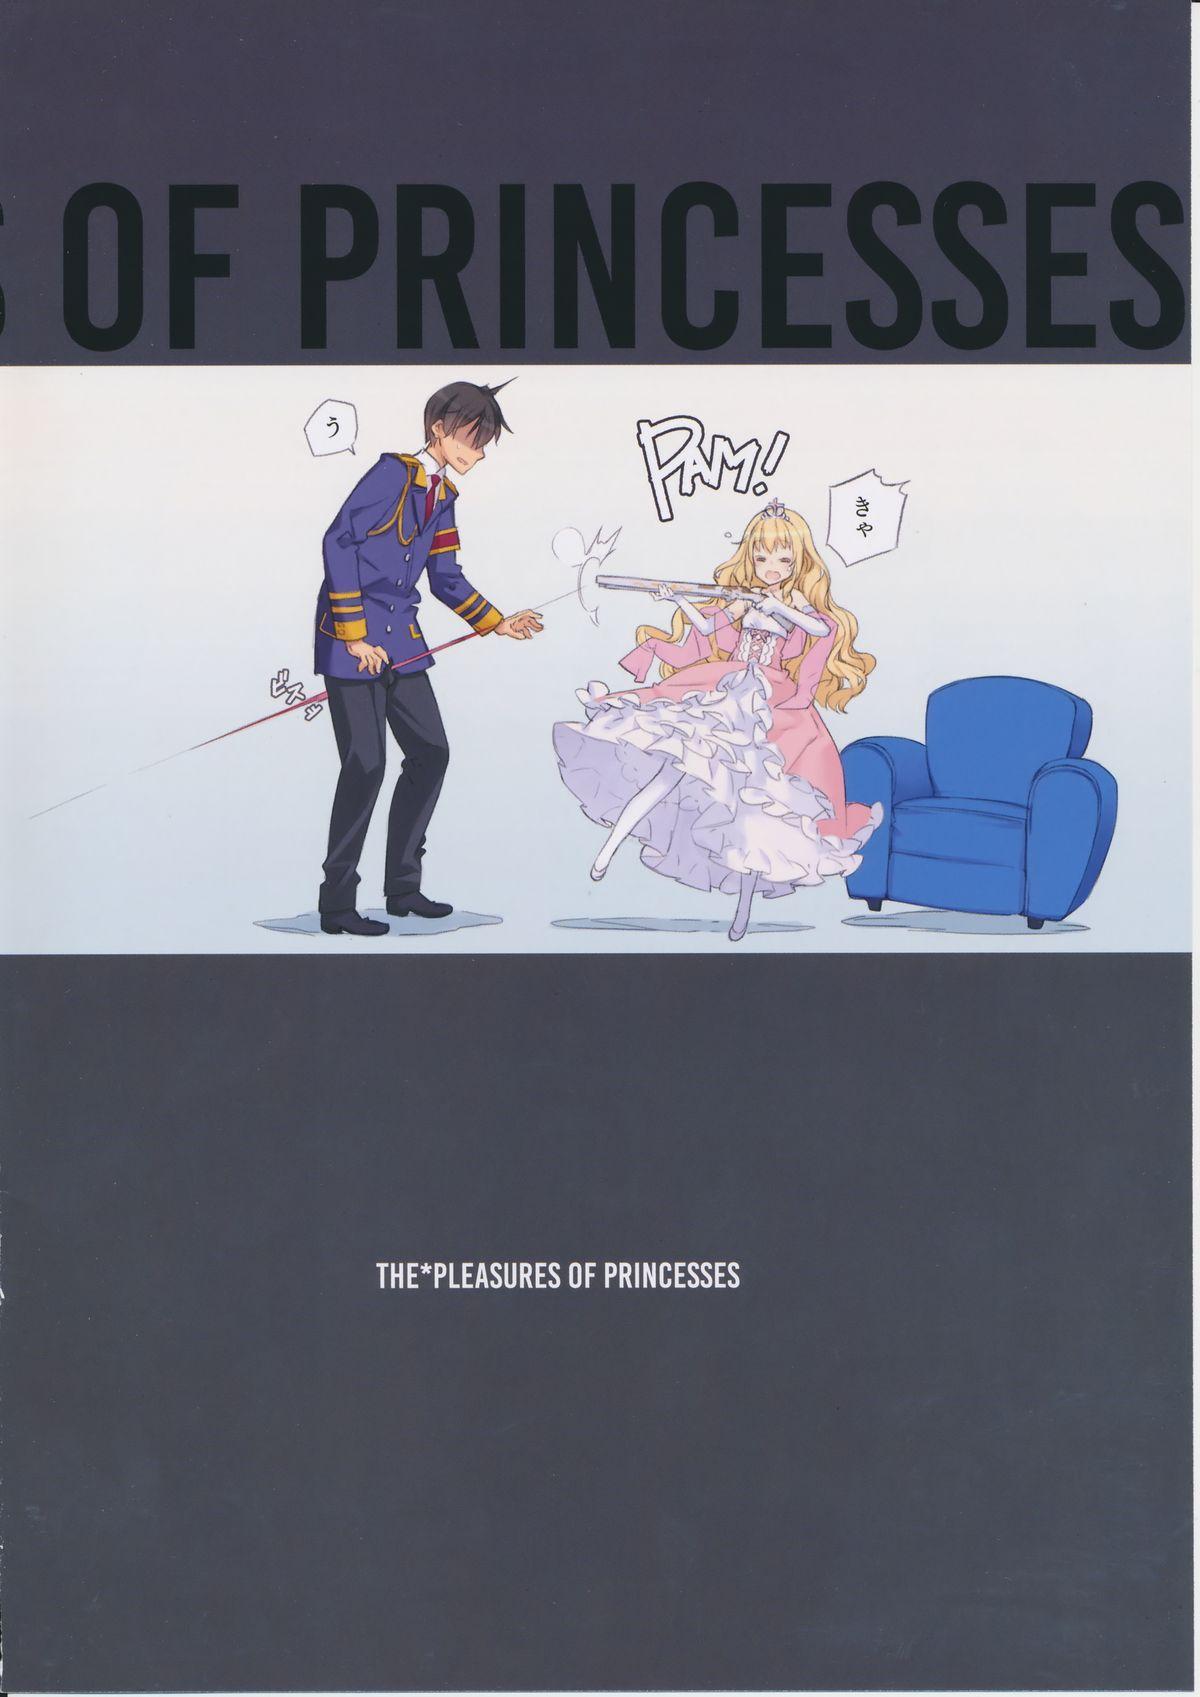 THE PLEASURES OF PRINCESSES 1